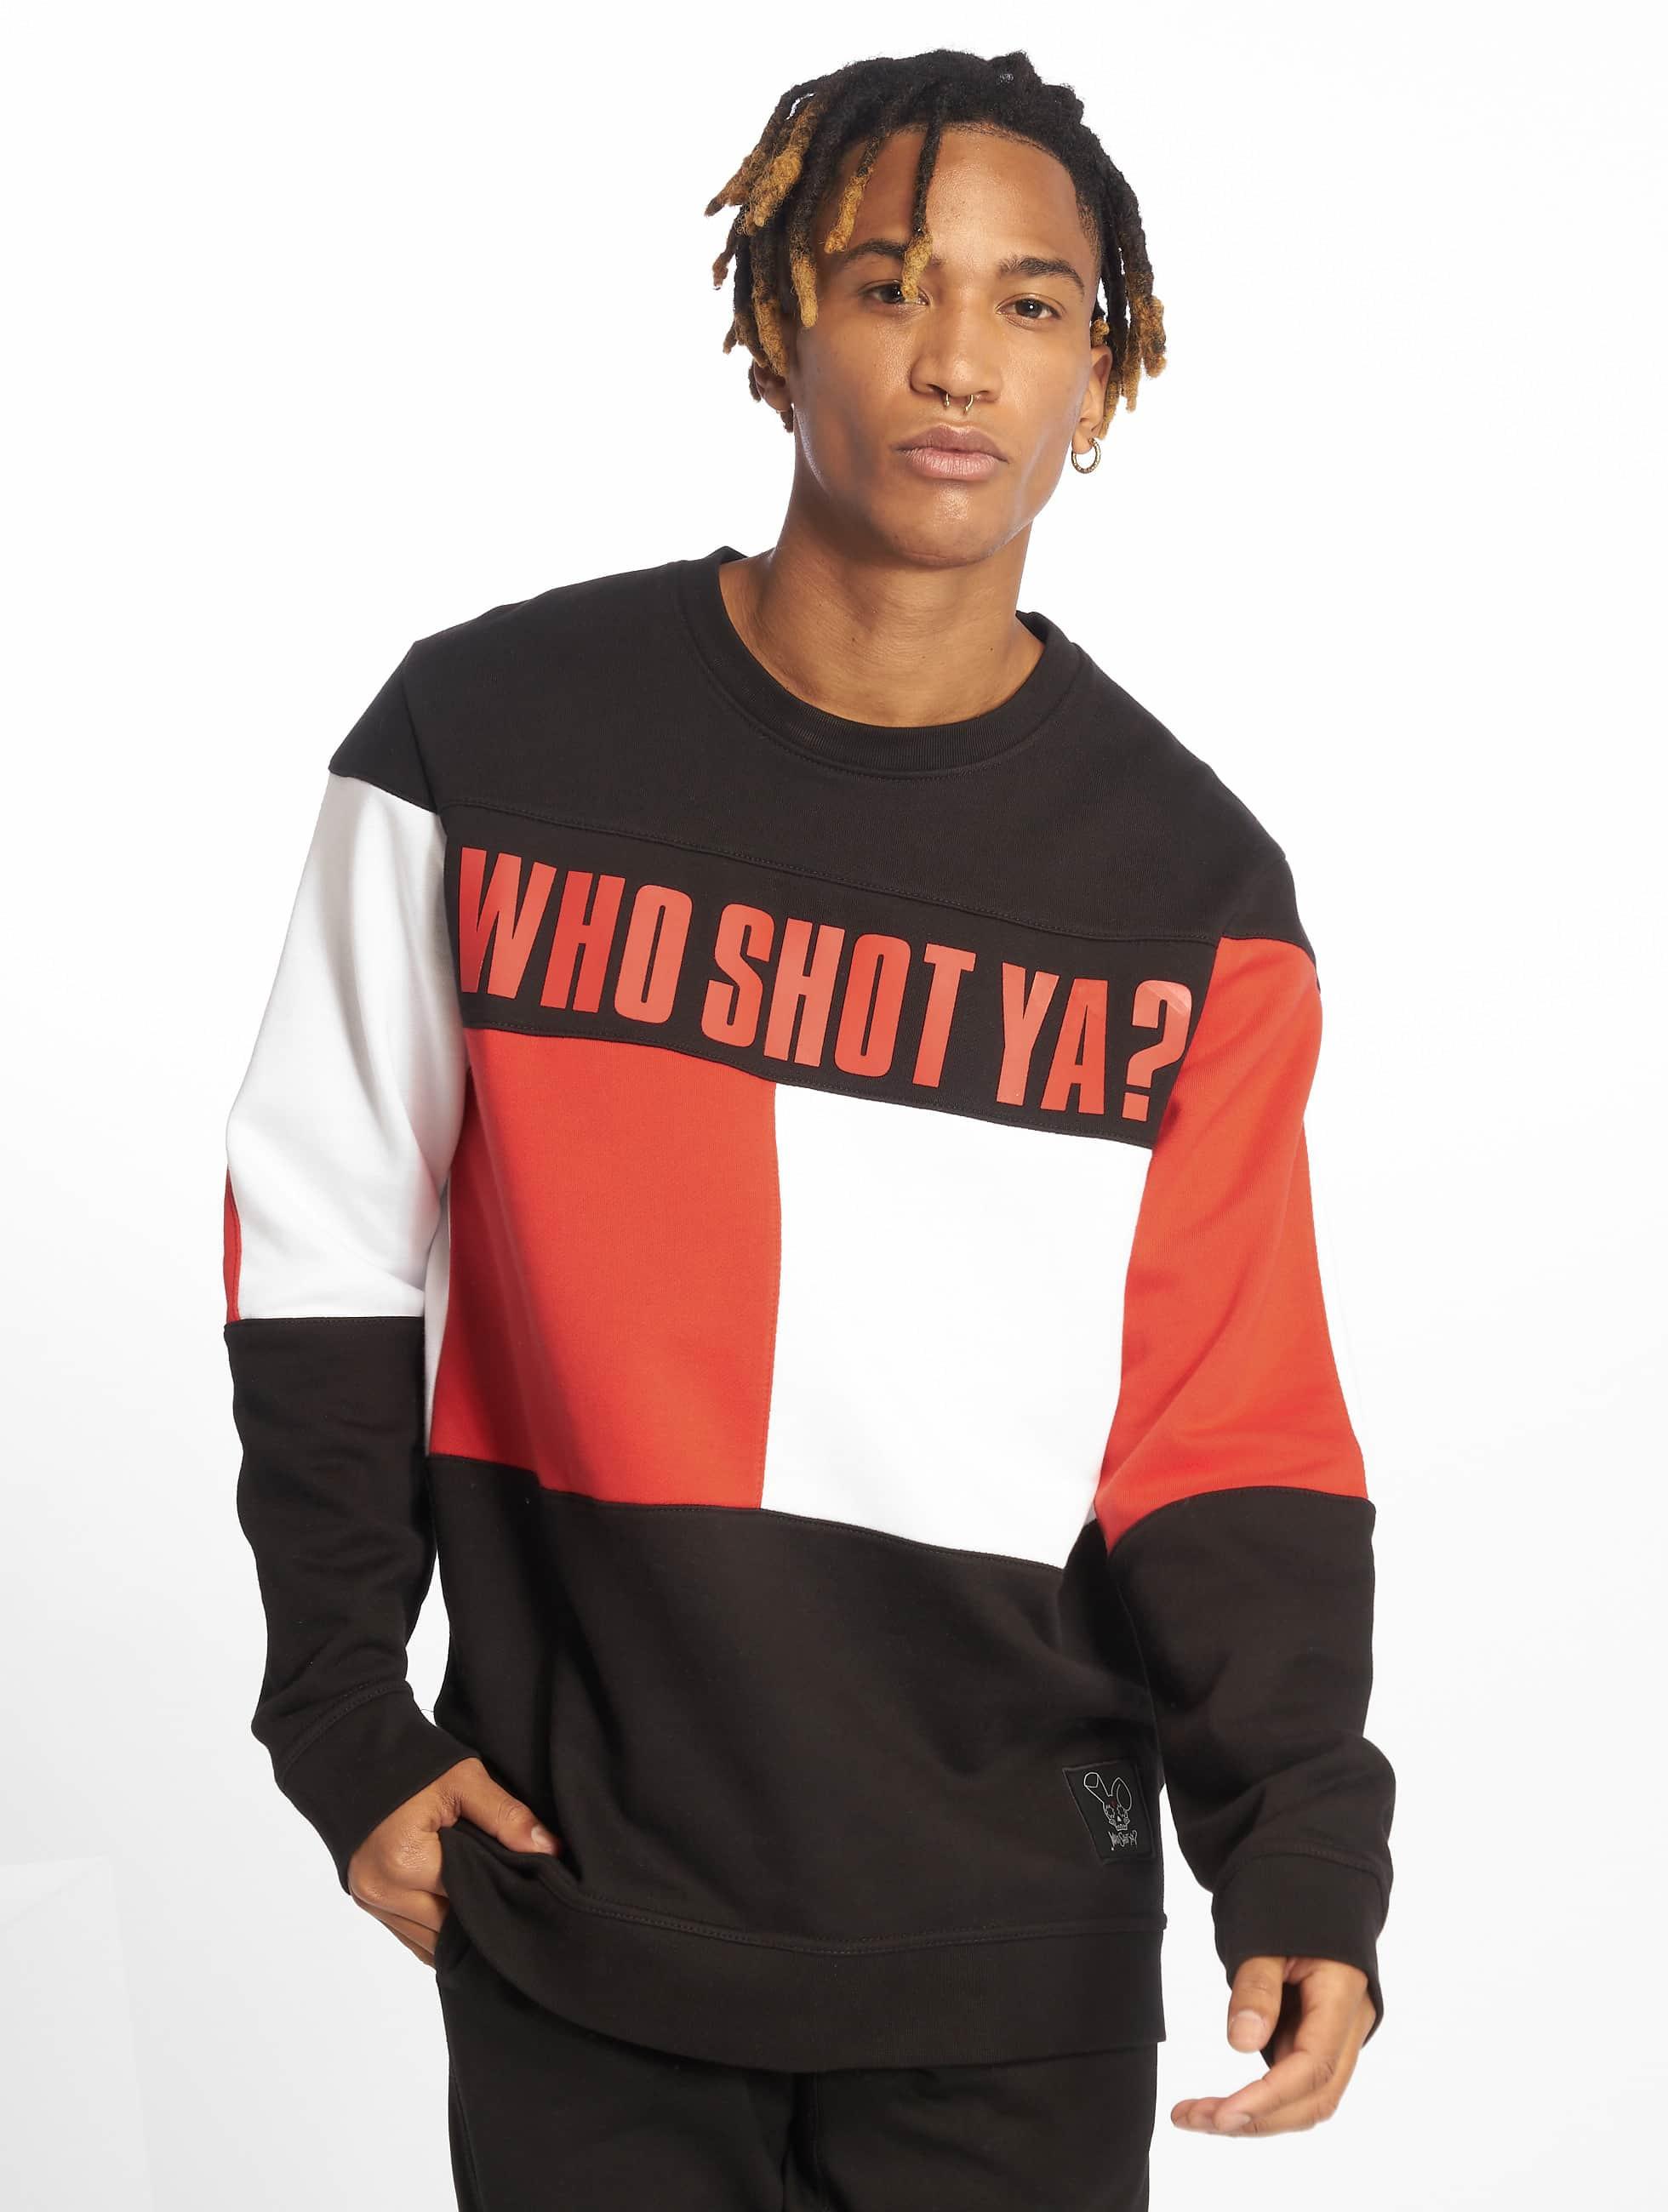 Who Shot Ya? / Jumper Block in black S